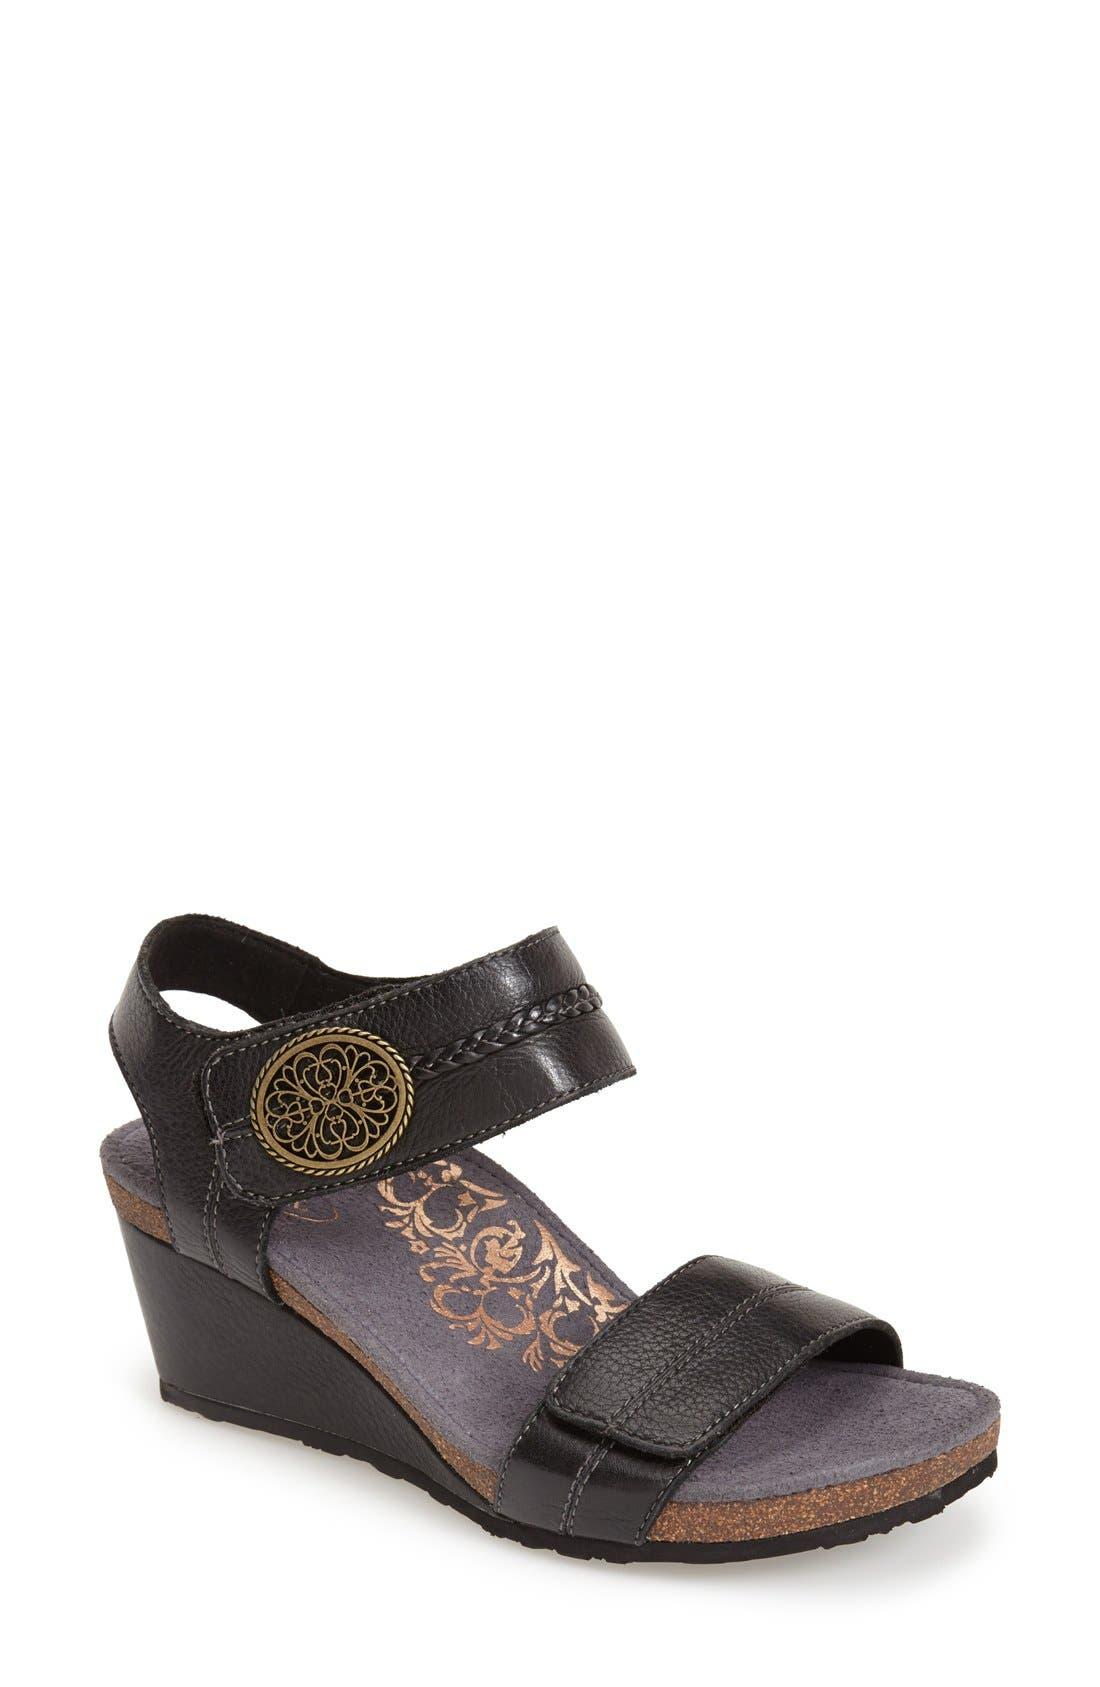 Aetrex 'Arielle' Leather Wedge Sandal (Women)